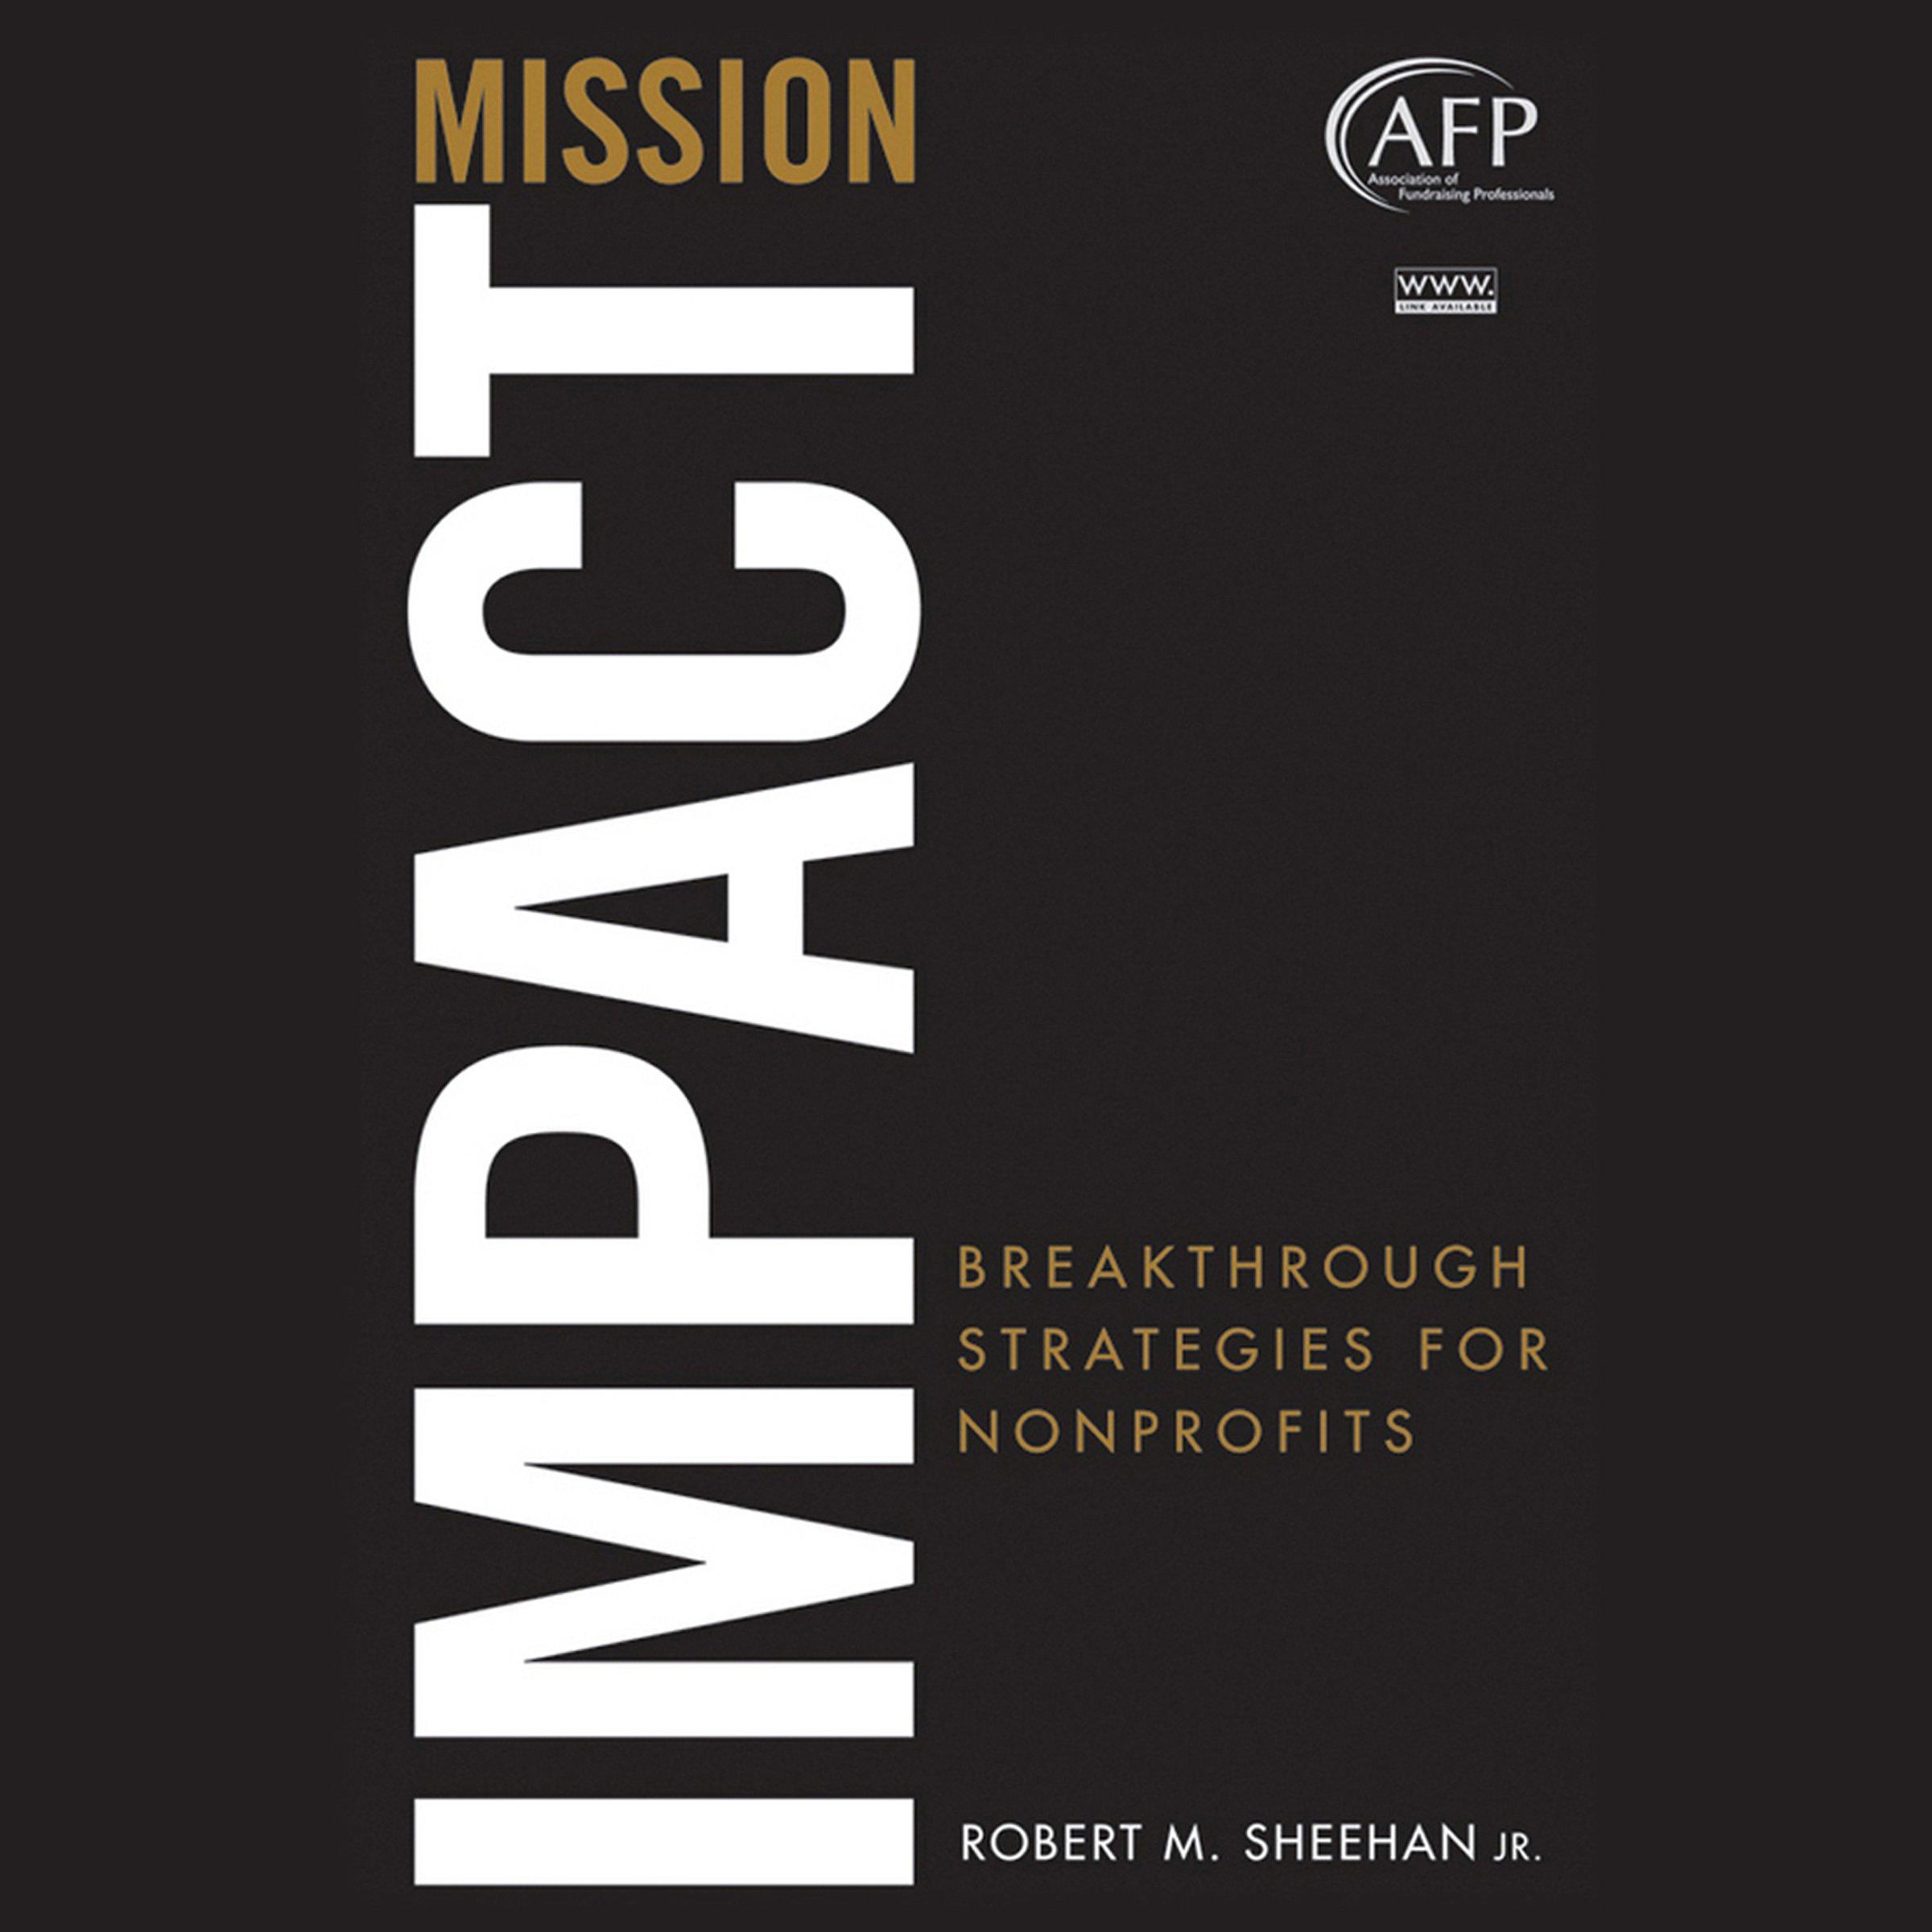 Mission Impact: Breakthrough Strategies for Nonprofits